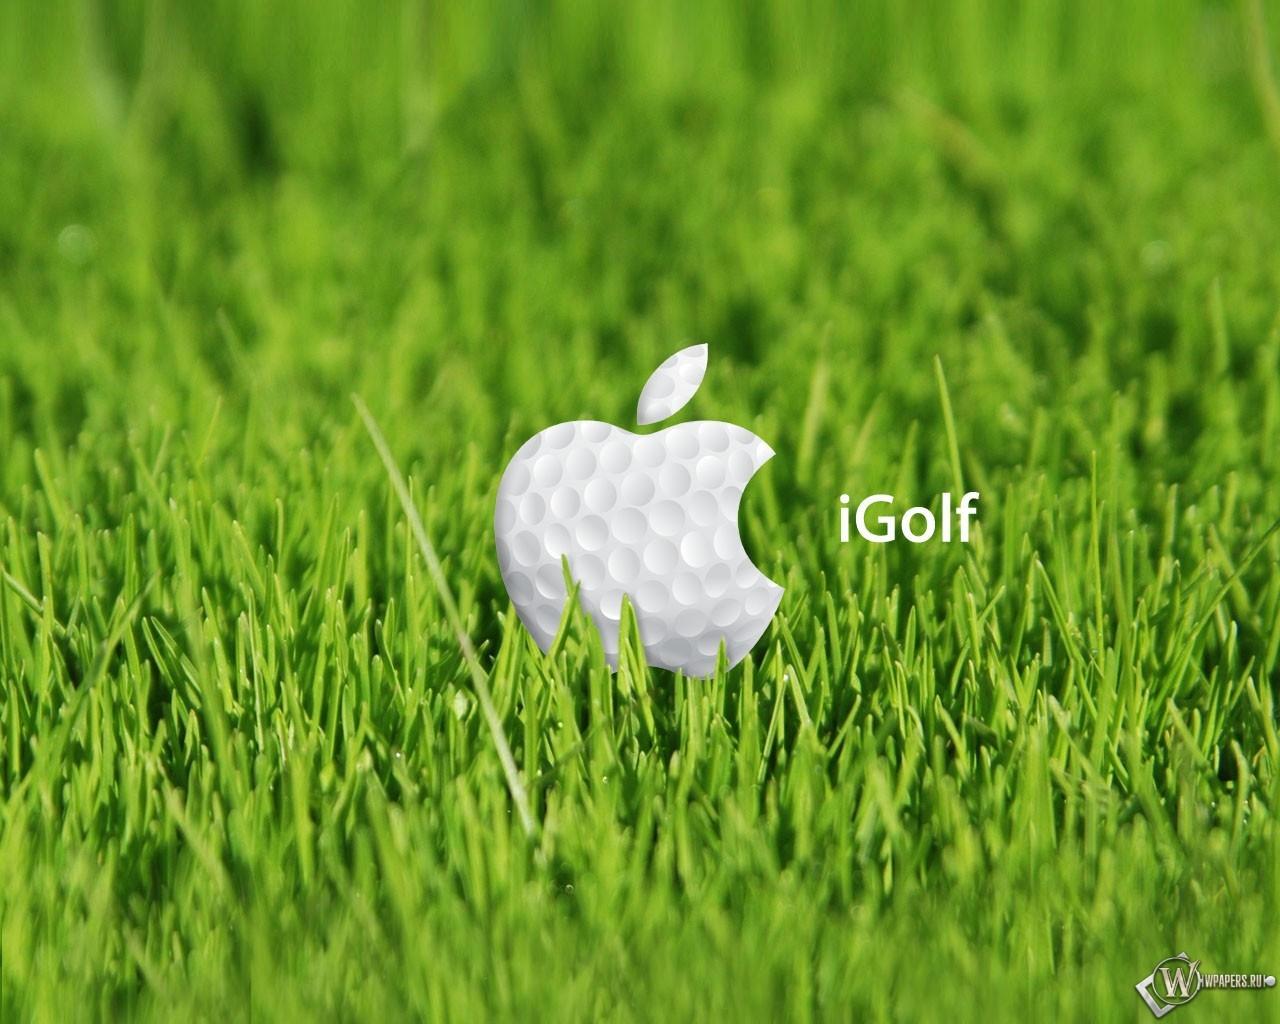 Apple igolf 1280x1024